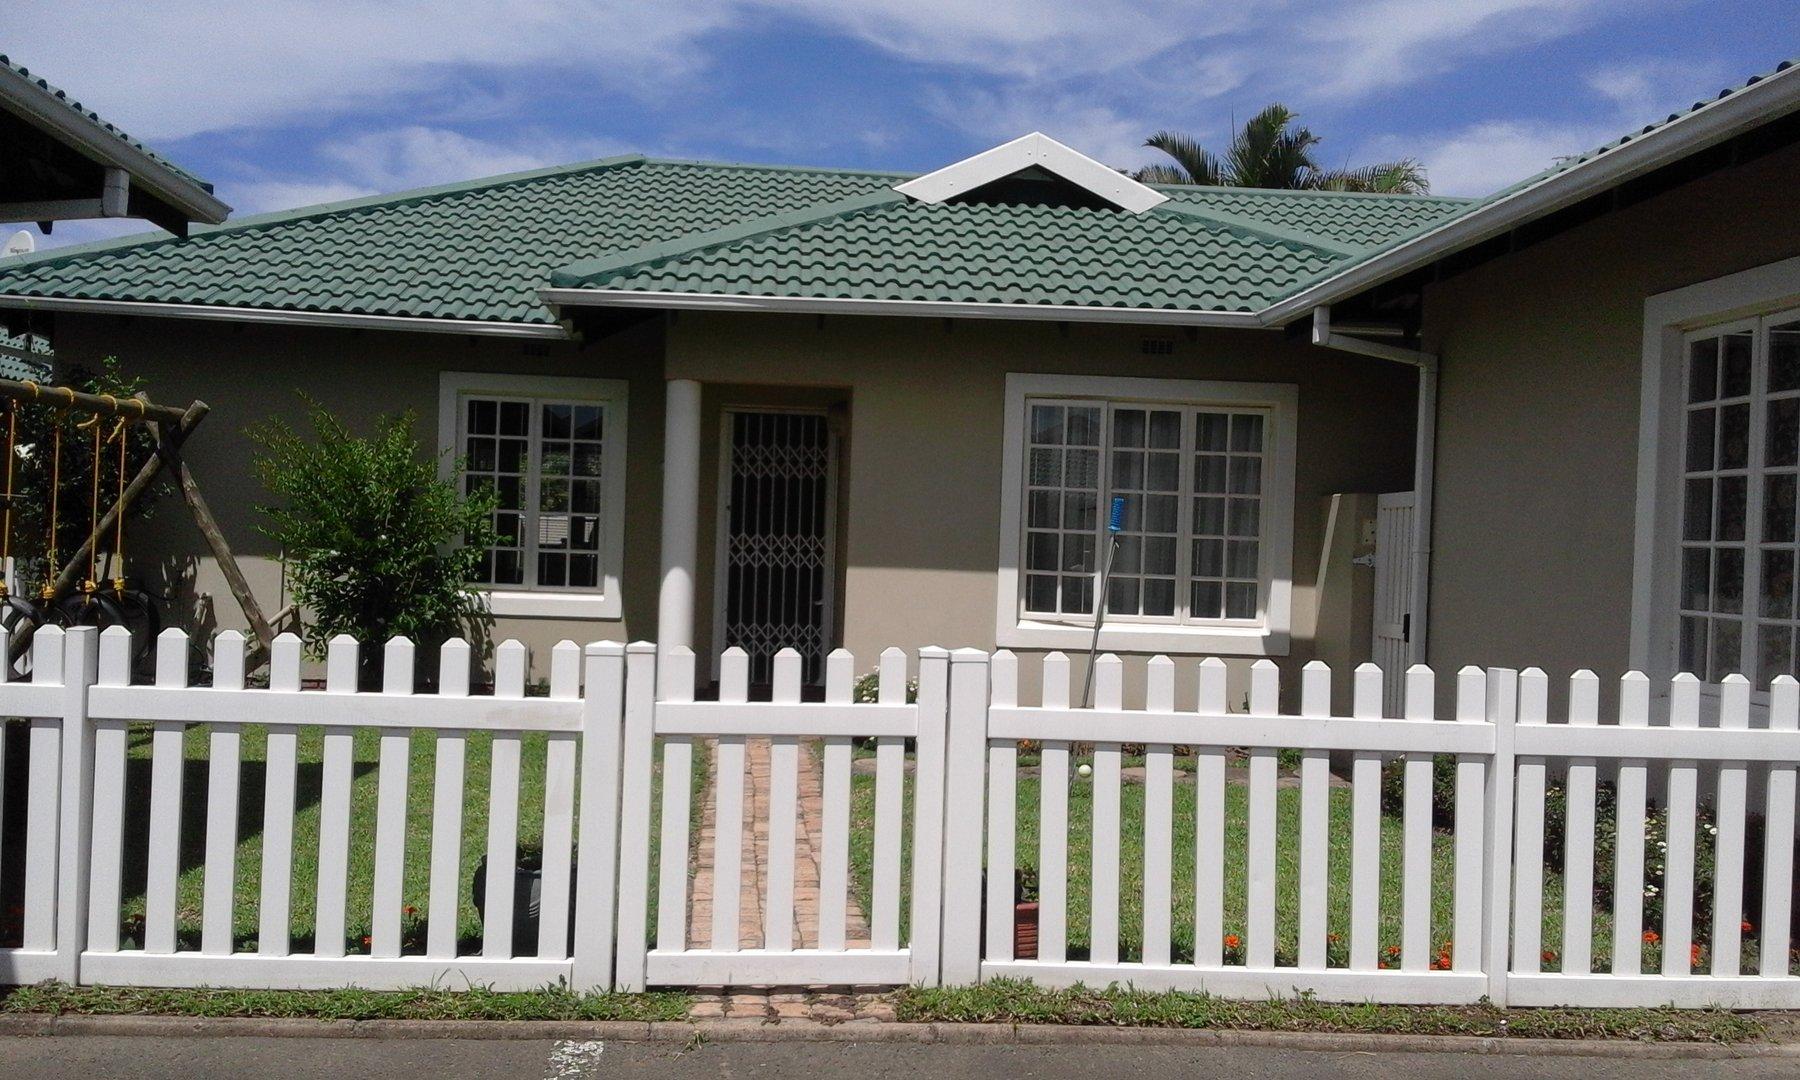 3 BedroomTownhouse To Rent In Mount Edgecombe